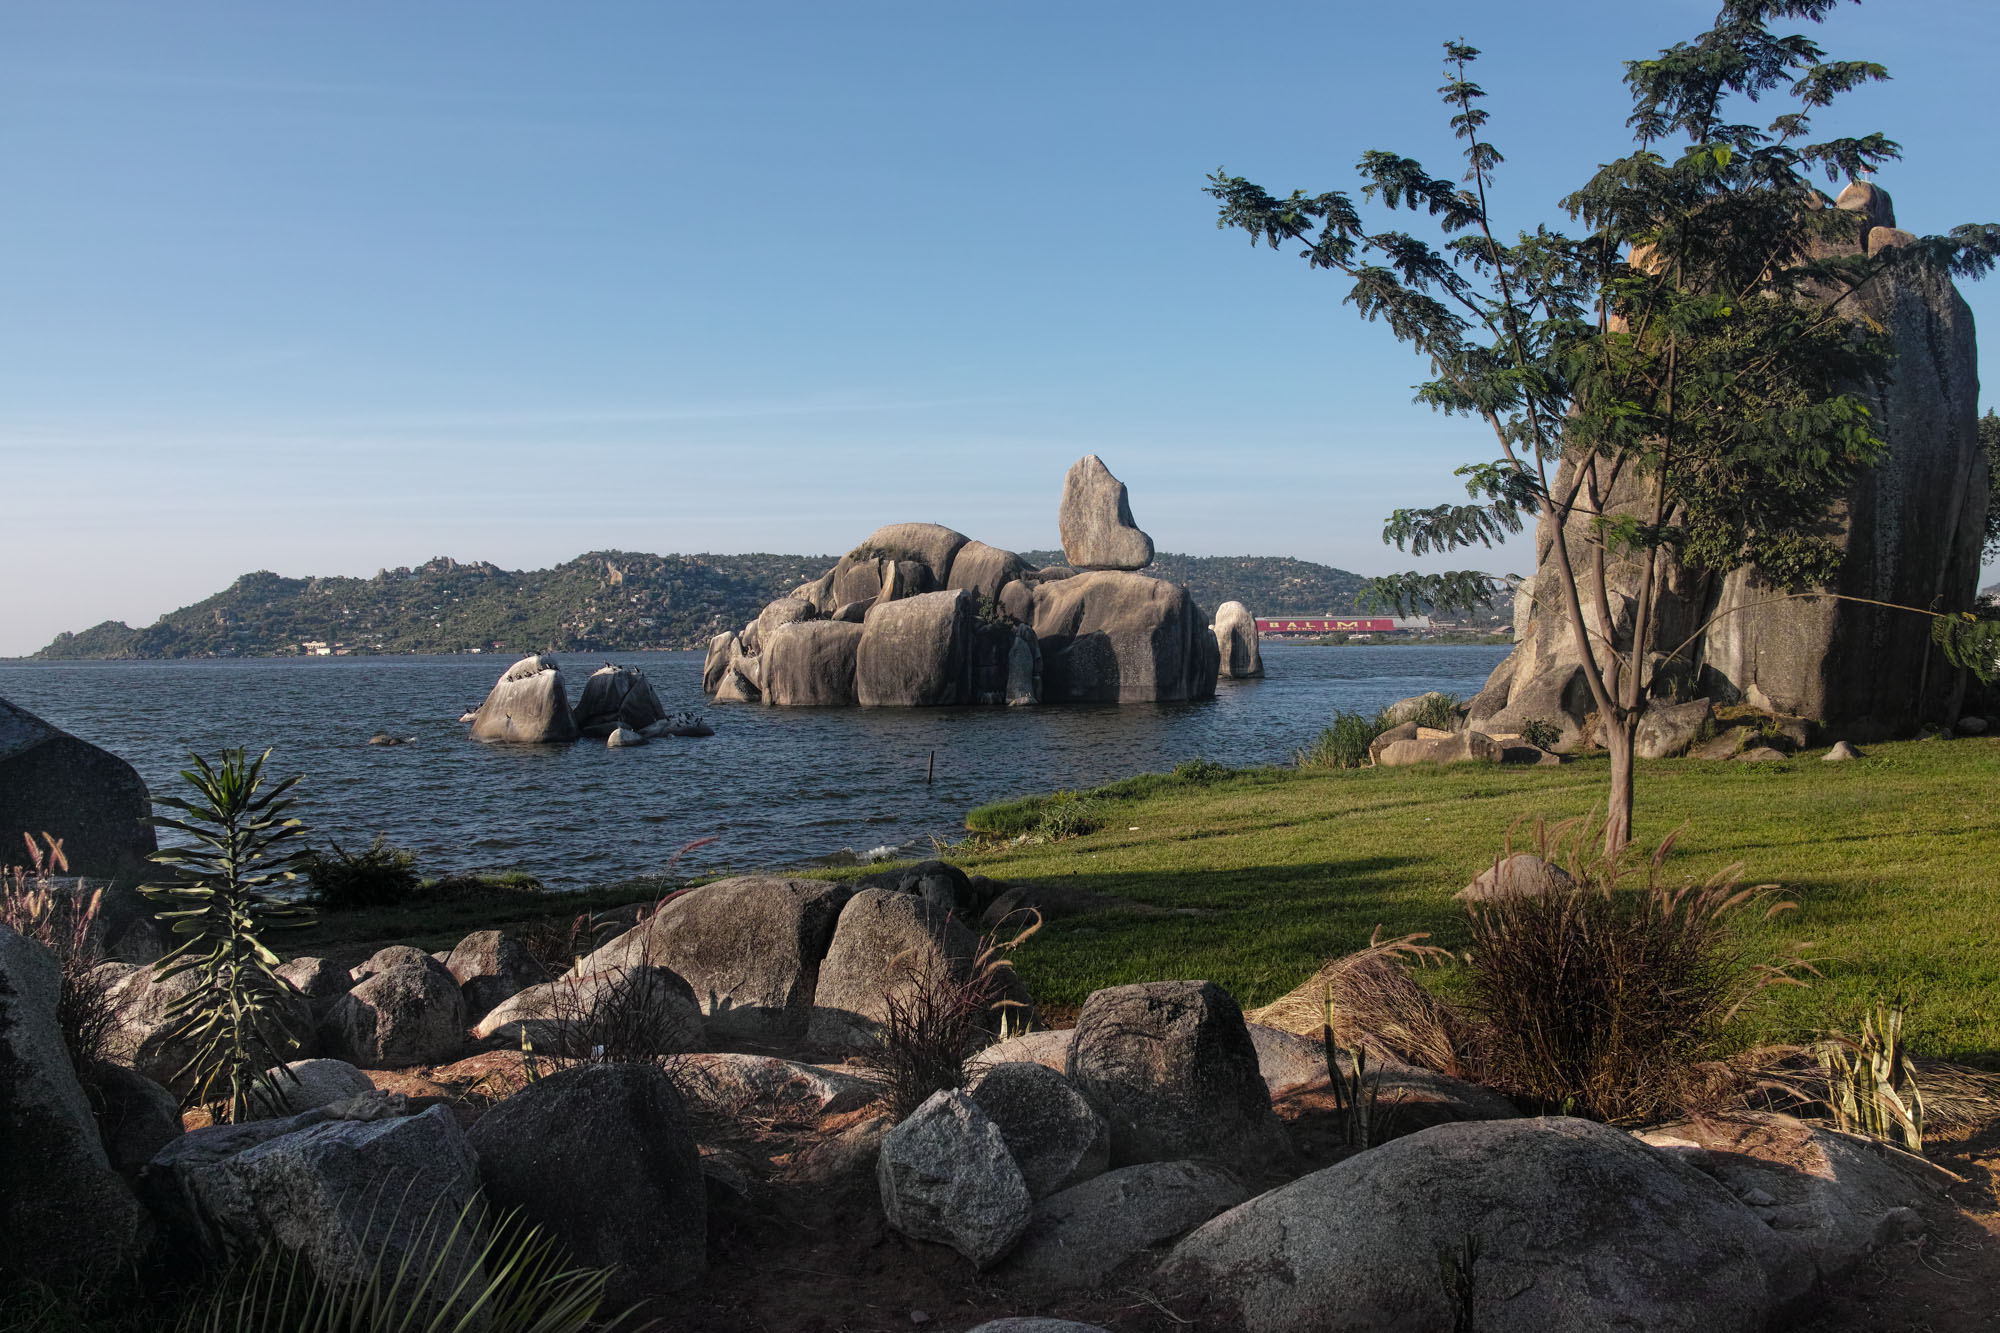 Bismarck Rock Mwanza Tanzania The Bismarck Rock in Mwanza